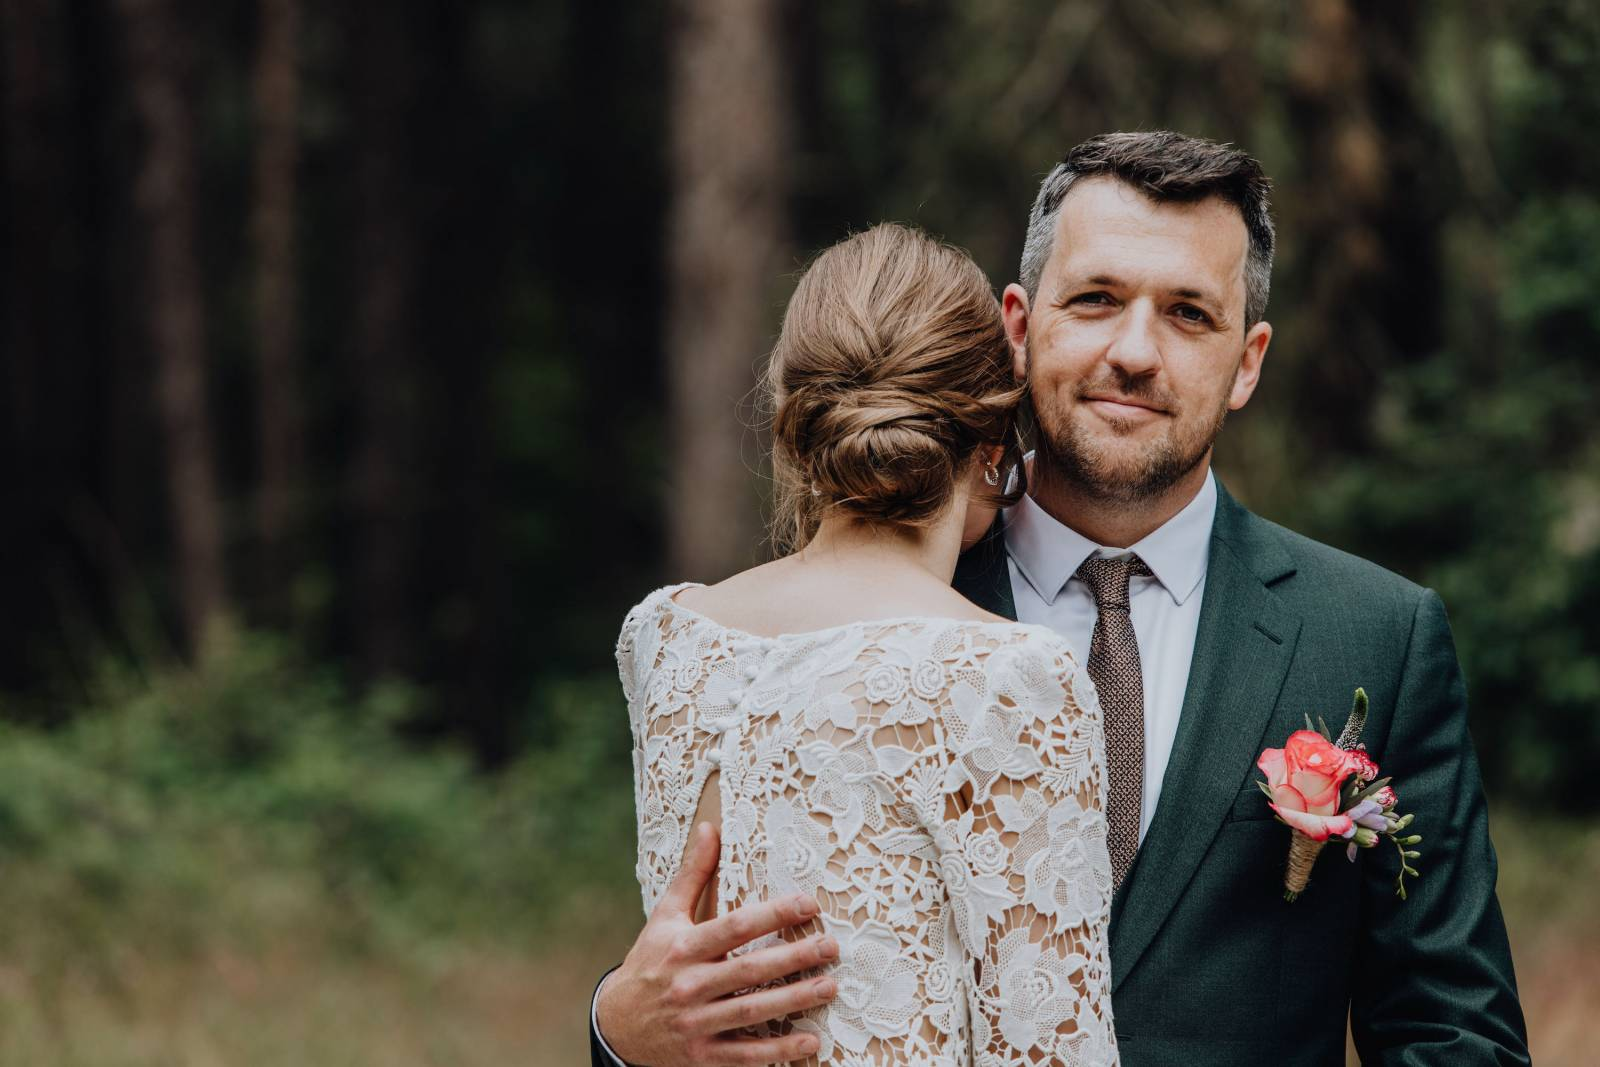 Alissia Porez - 5D4_9793 - Elise Buyse - Fotograaf Luxvisuals - House of Weddings